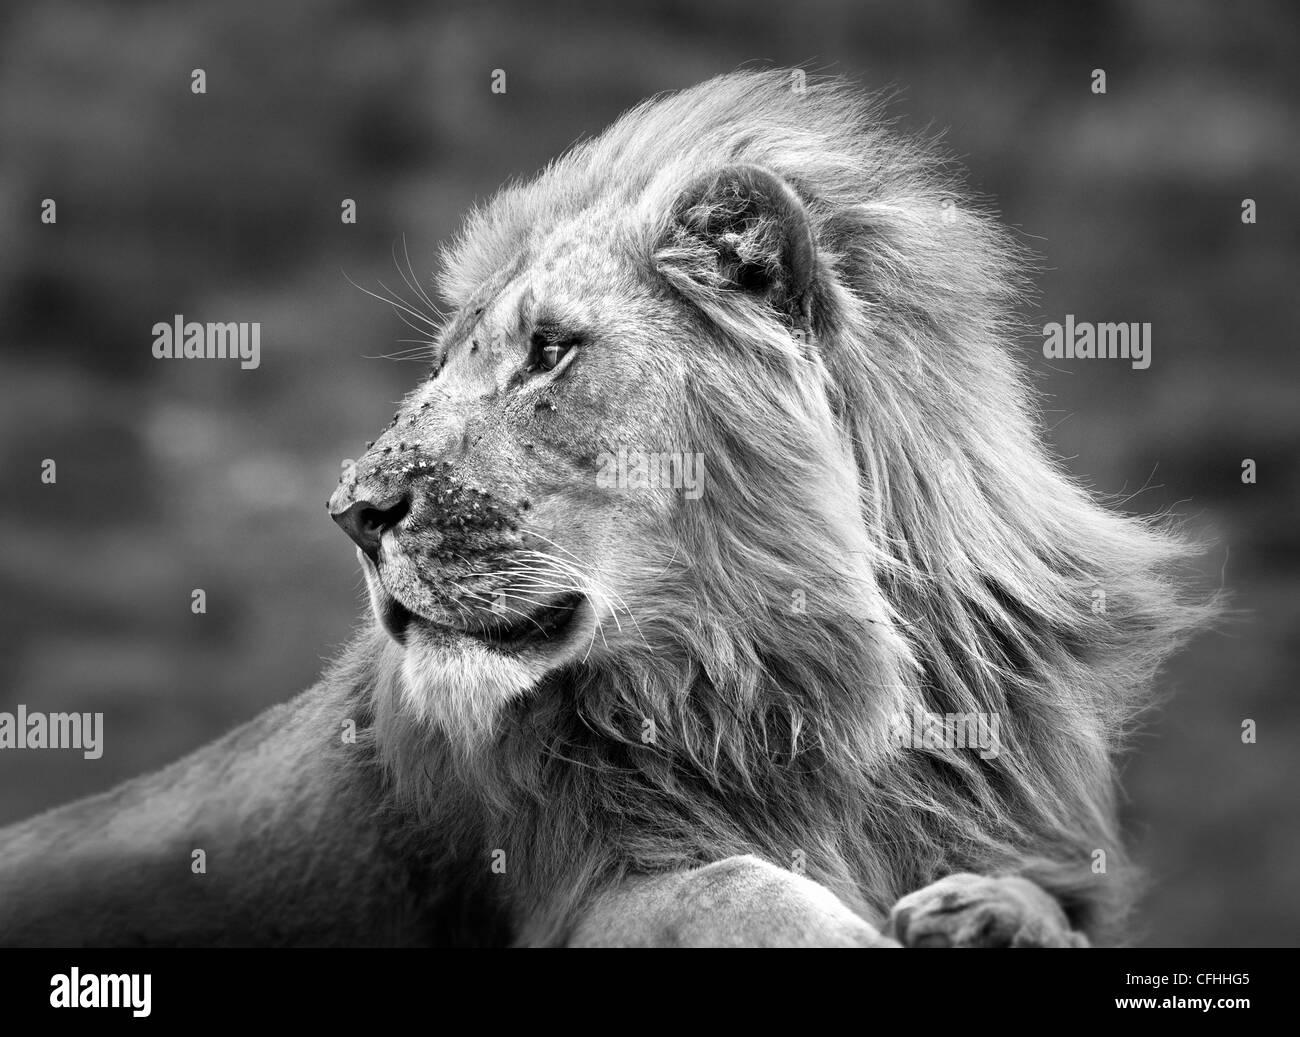 Retrato de leones africanos, Sudáfrica Imagen De Stock